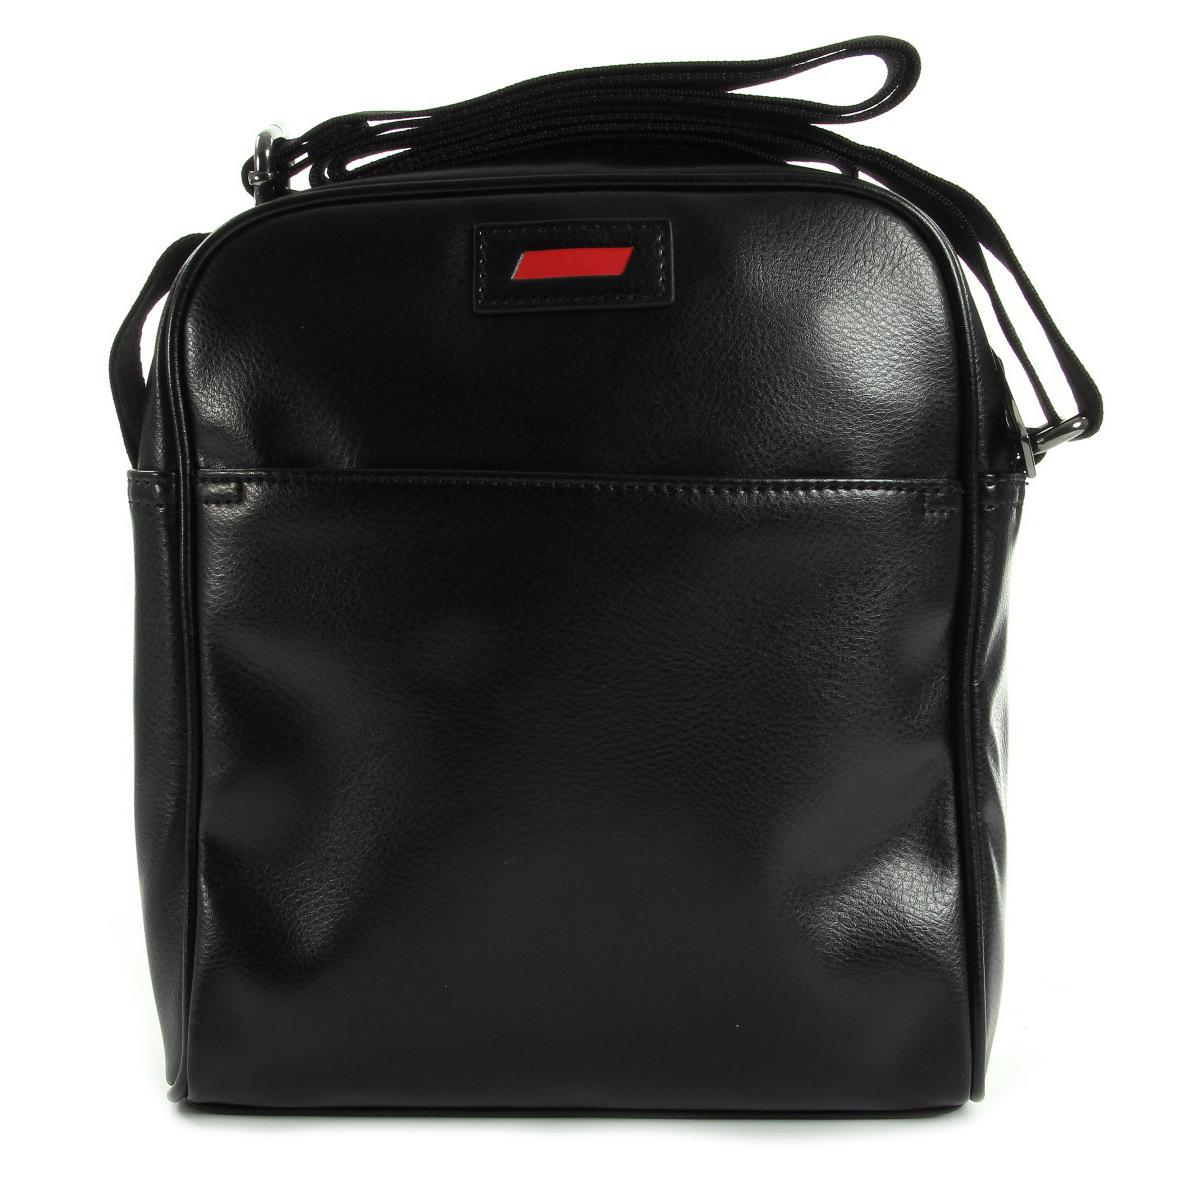 puma ferrari ls portable black 07394101 sacs bandouli re sacoches unisexe. Black Bedroom Furniture Sets. Home Design Ideas